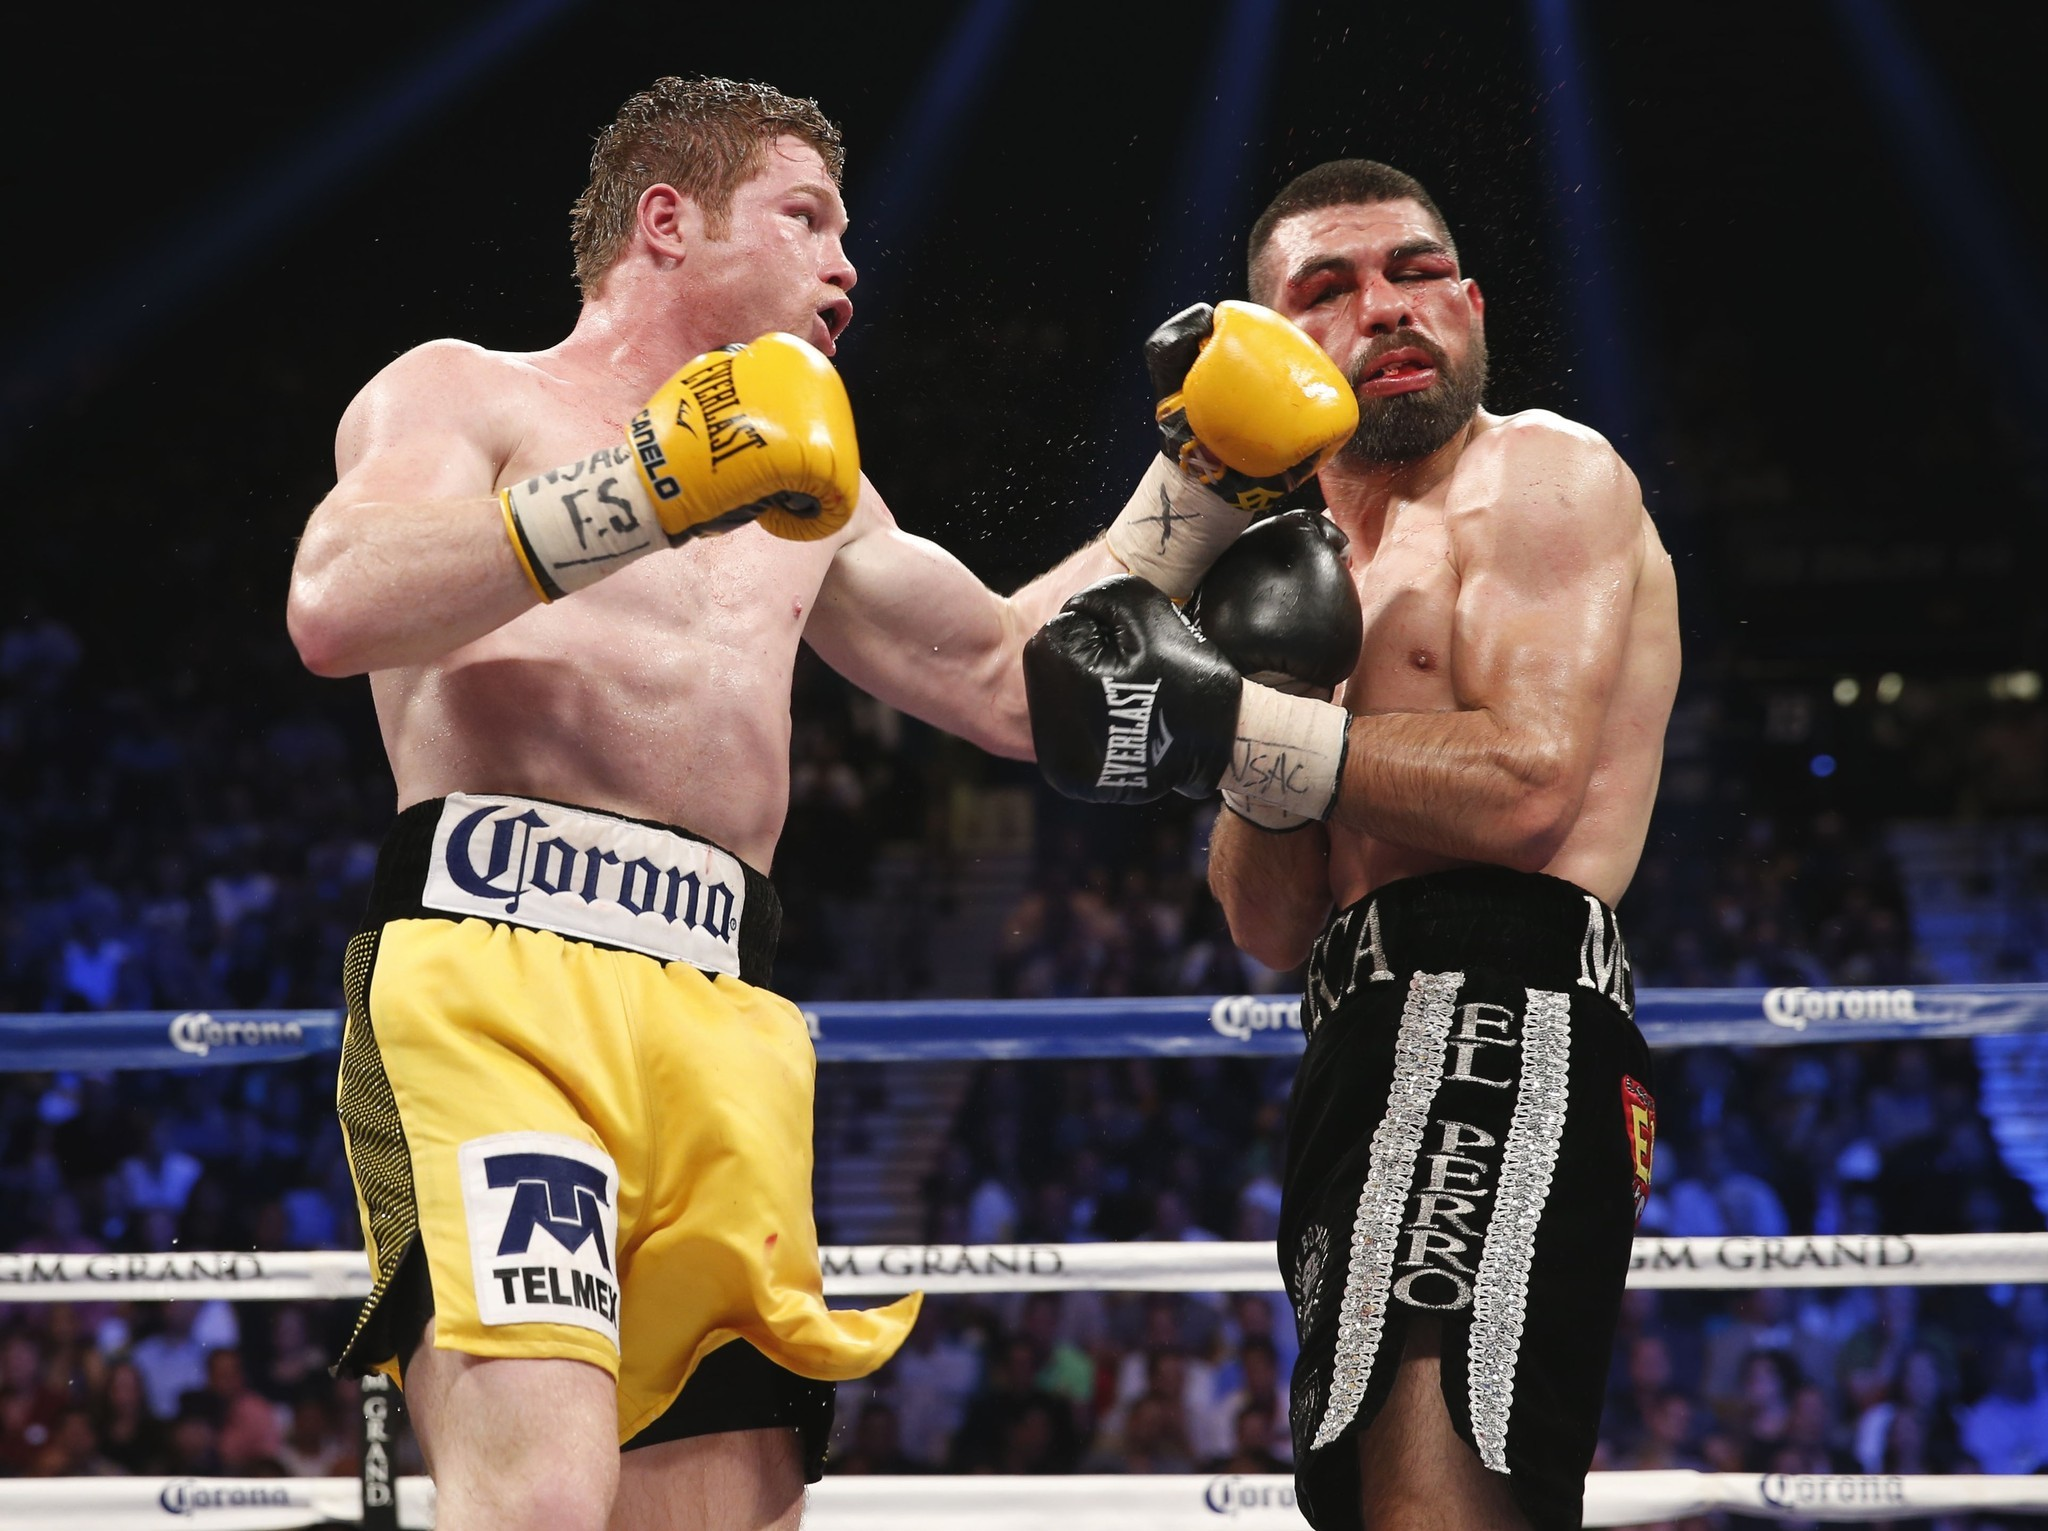 340866265520069640 additionally Miguel Cotto Next Fight Announced furthermore 196023 besides 2 further Oscar De La Hoya Julio Cesar Chavez Get Flashbacks Of Their Fights. on oscar de la hoya 2017